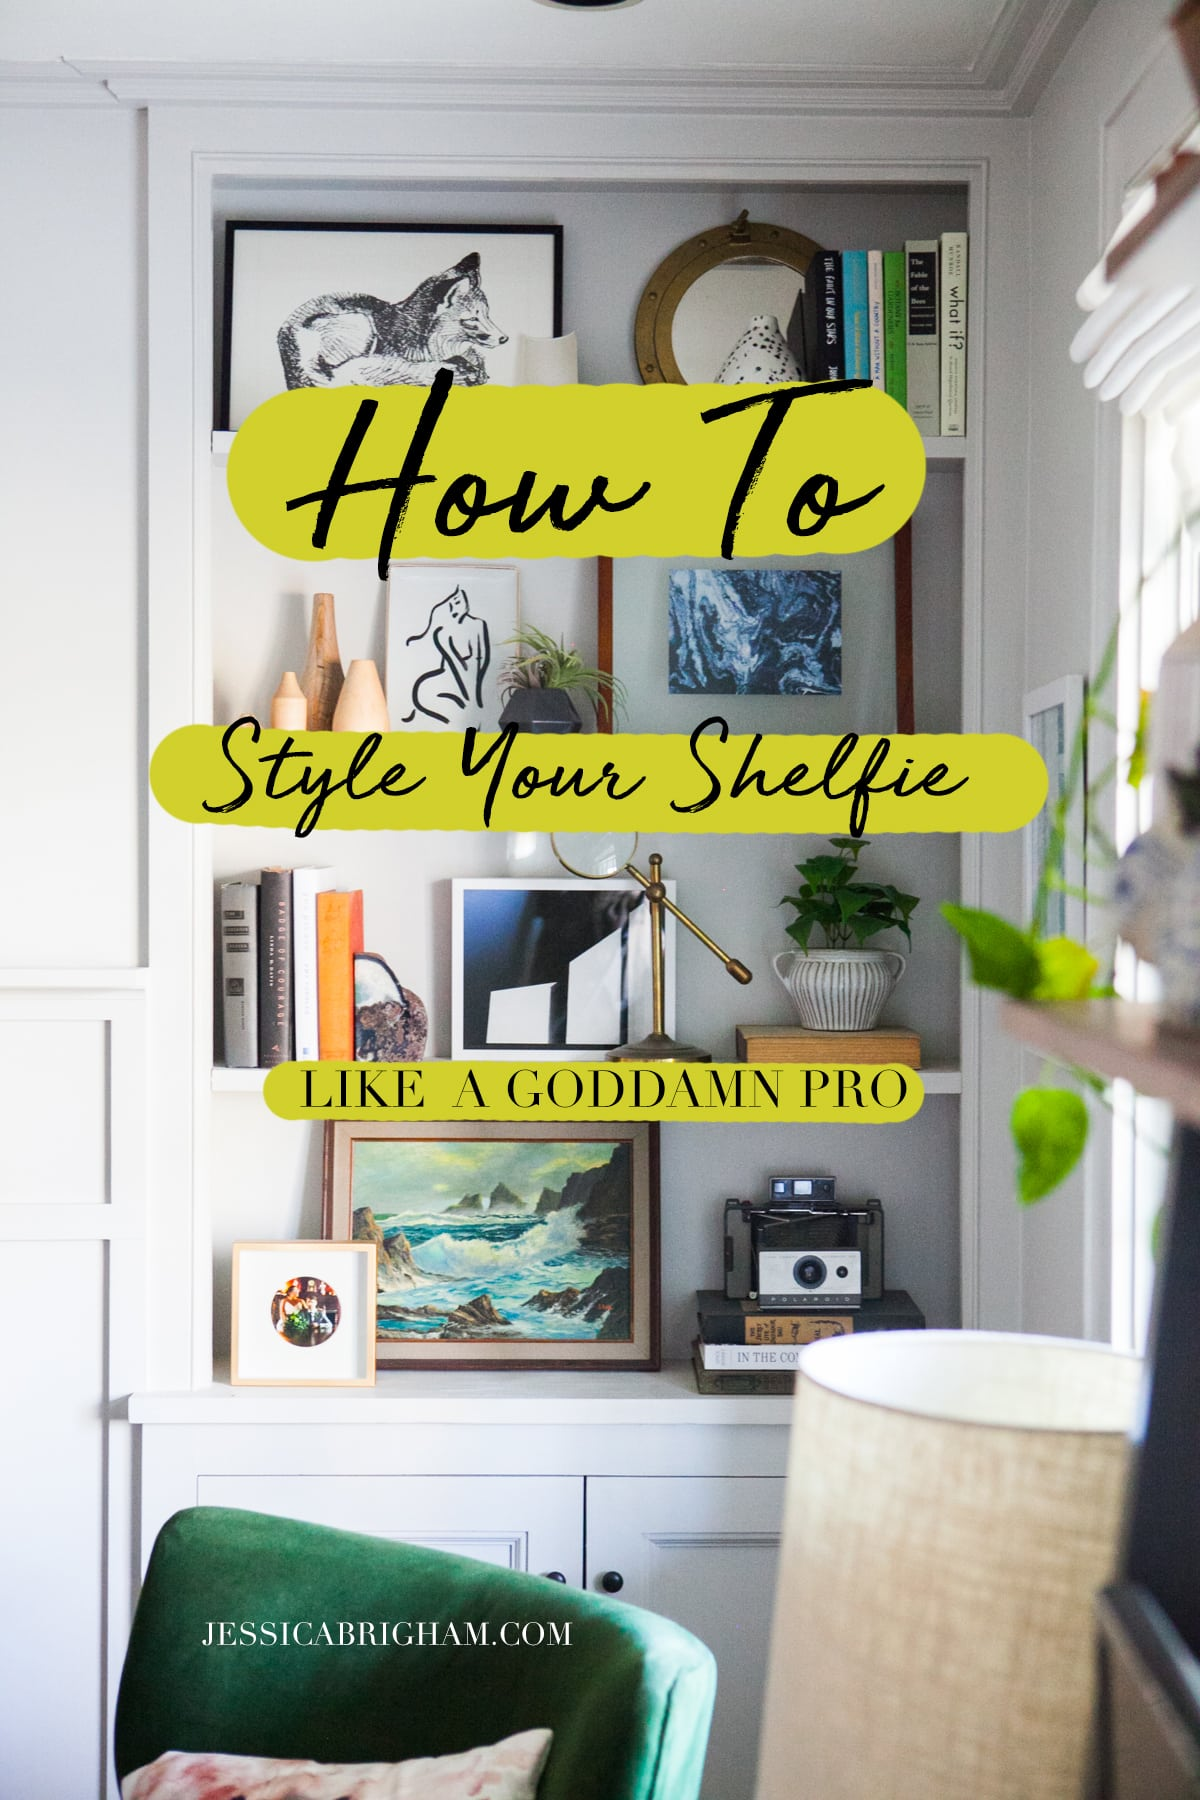 How to Style Your Shelfie Like A Goddamn Pro | Open Shelving | Shelf Decor Ideas | Jessica Brigham | Magazine Ready for Life